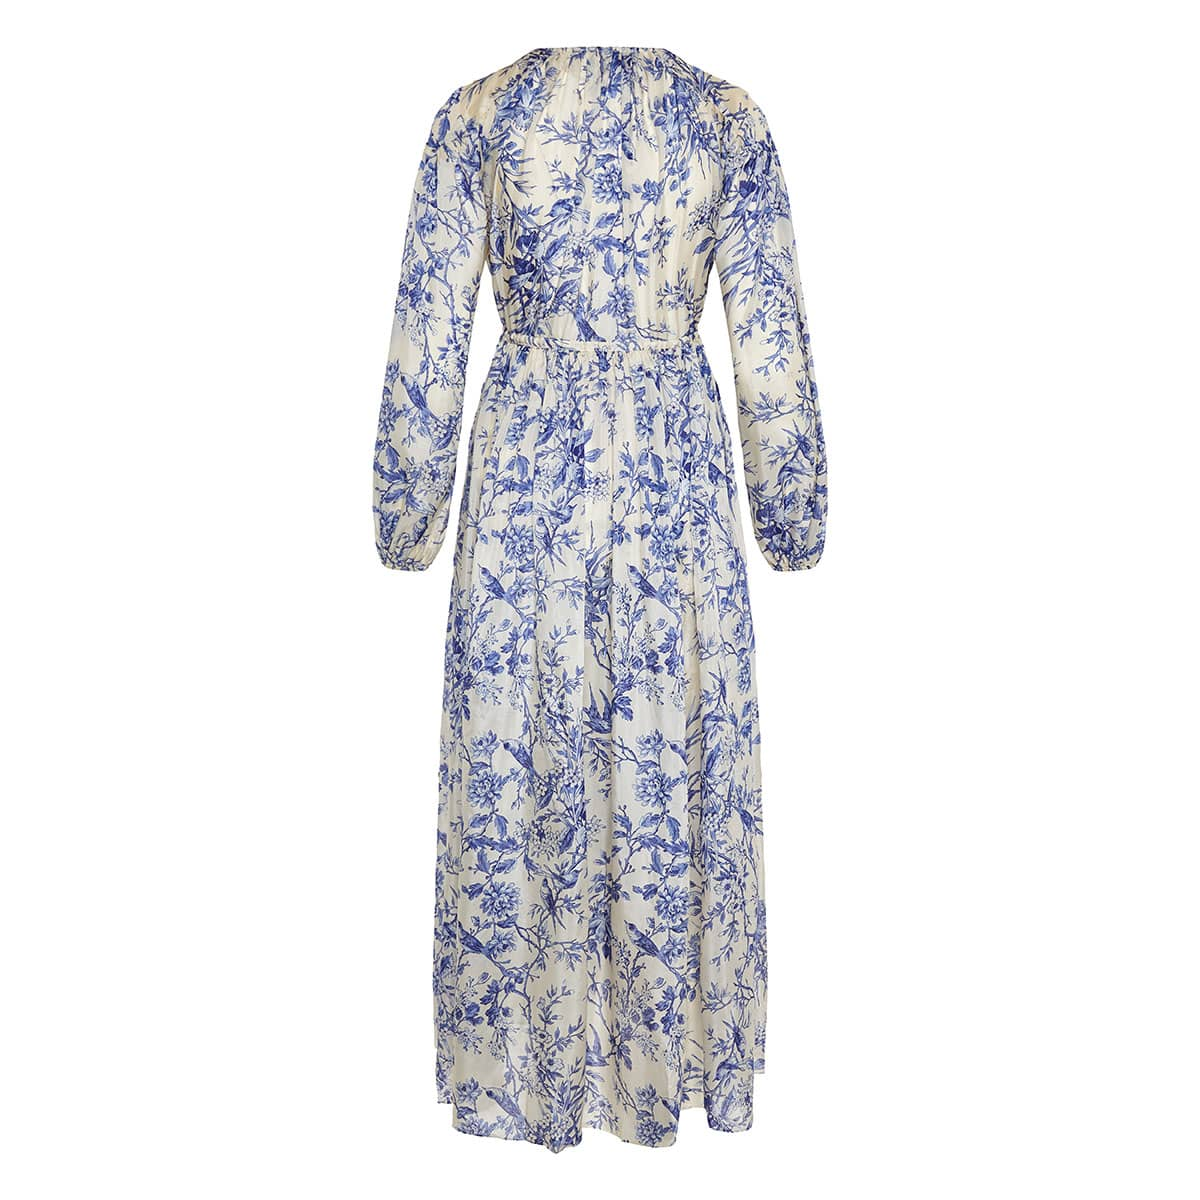 Verity floral gathered midi dress